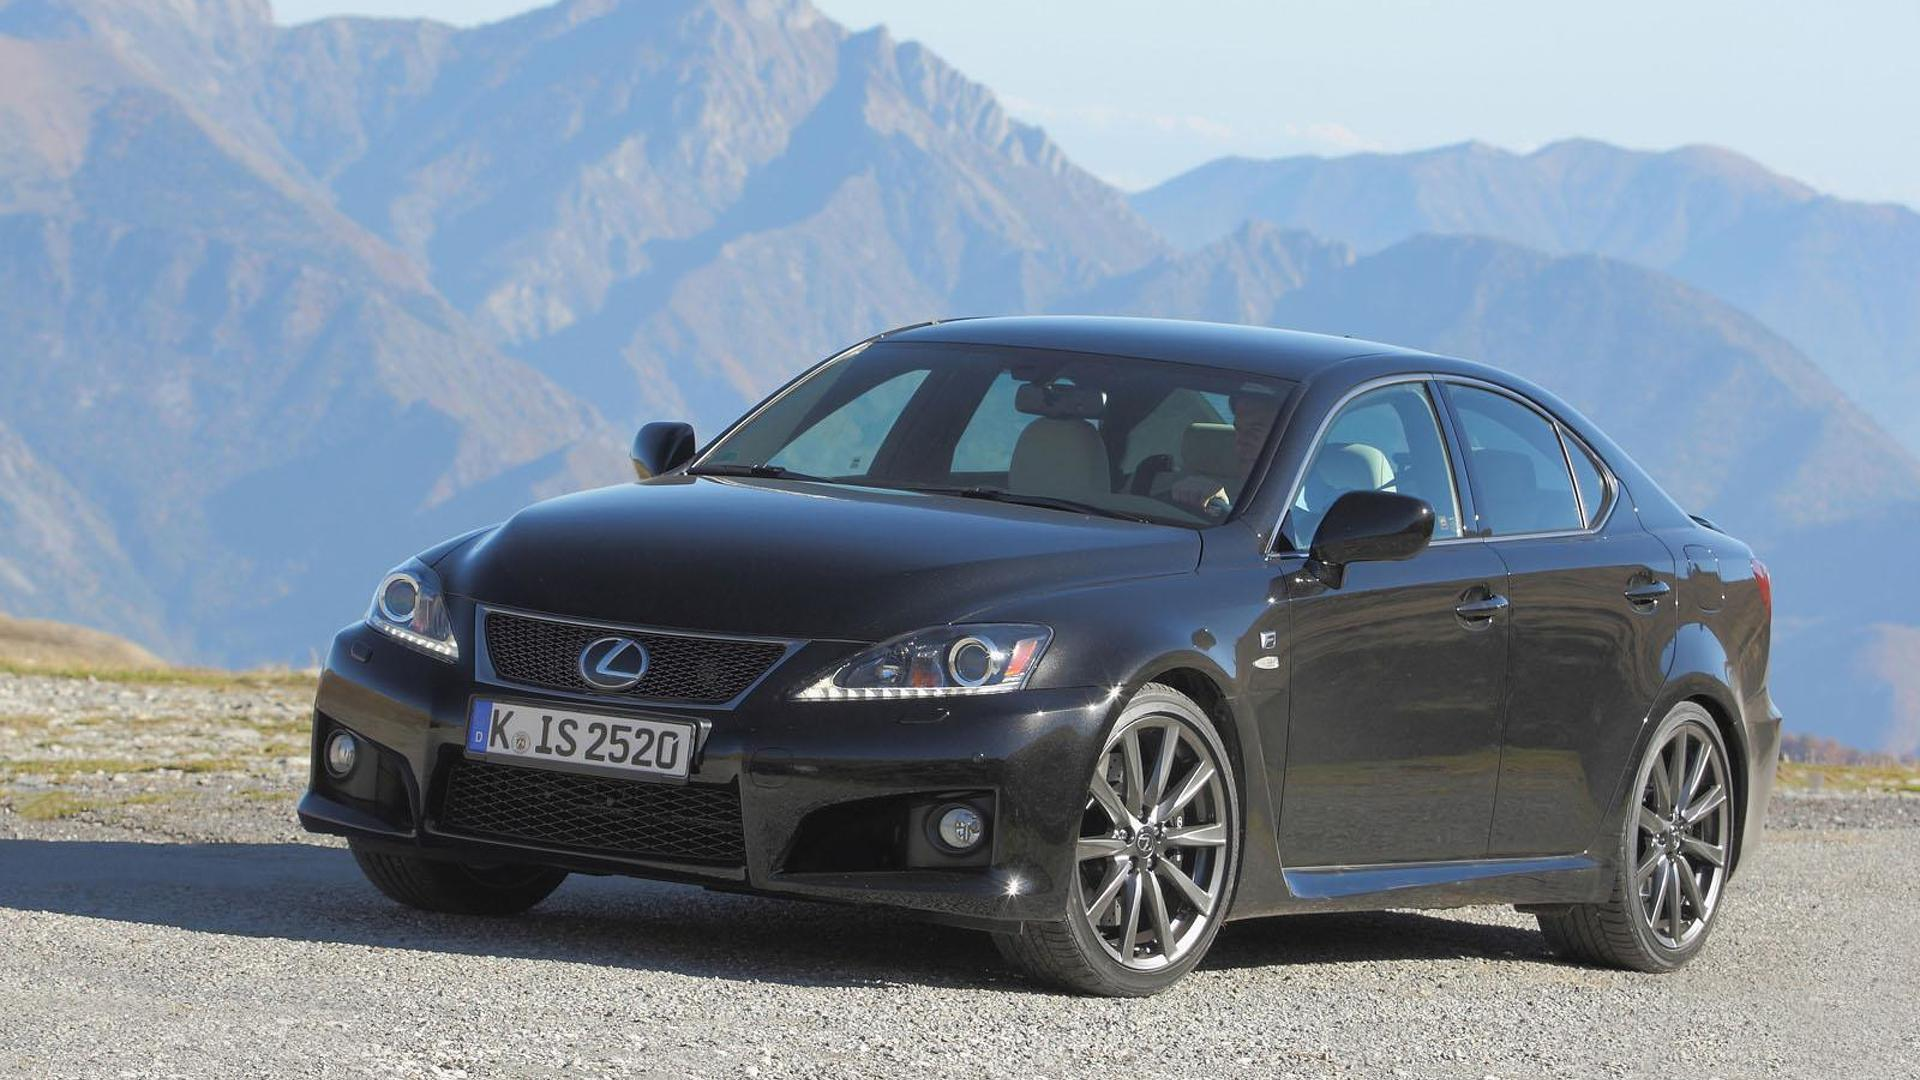 2012 Lexus IS-F unveiled